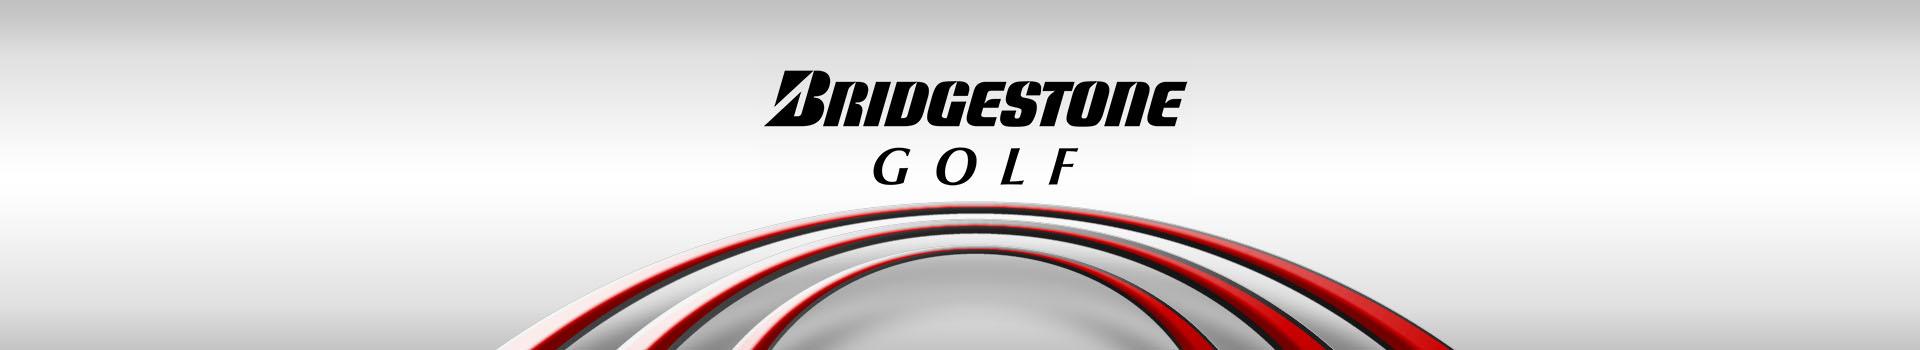 Bridgestone Golf